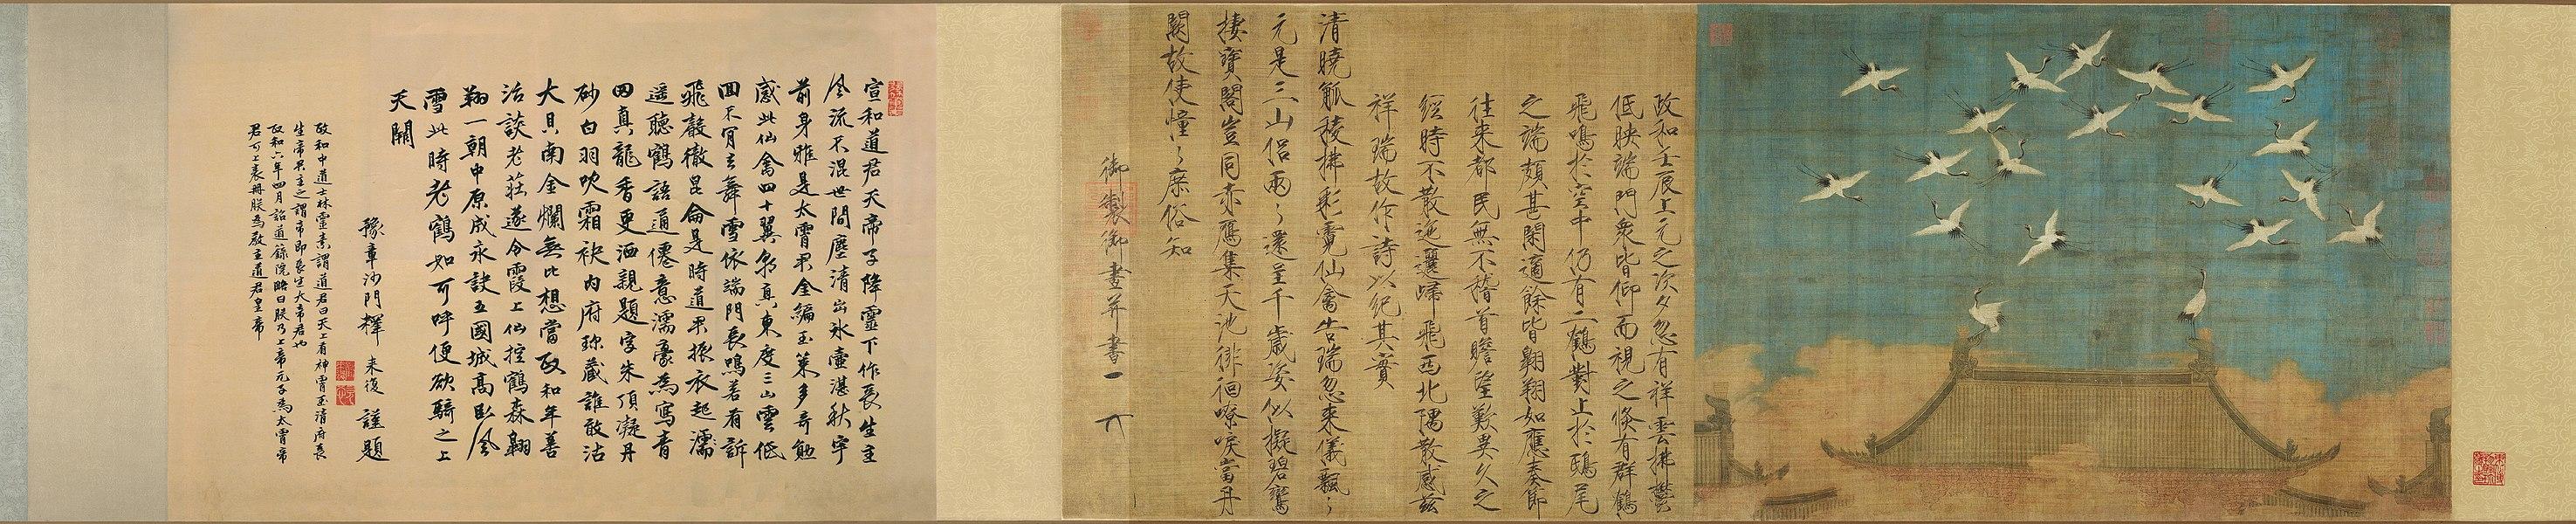 emperor huizong of song - image 2